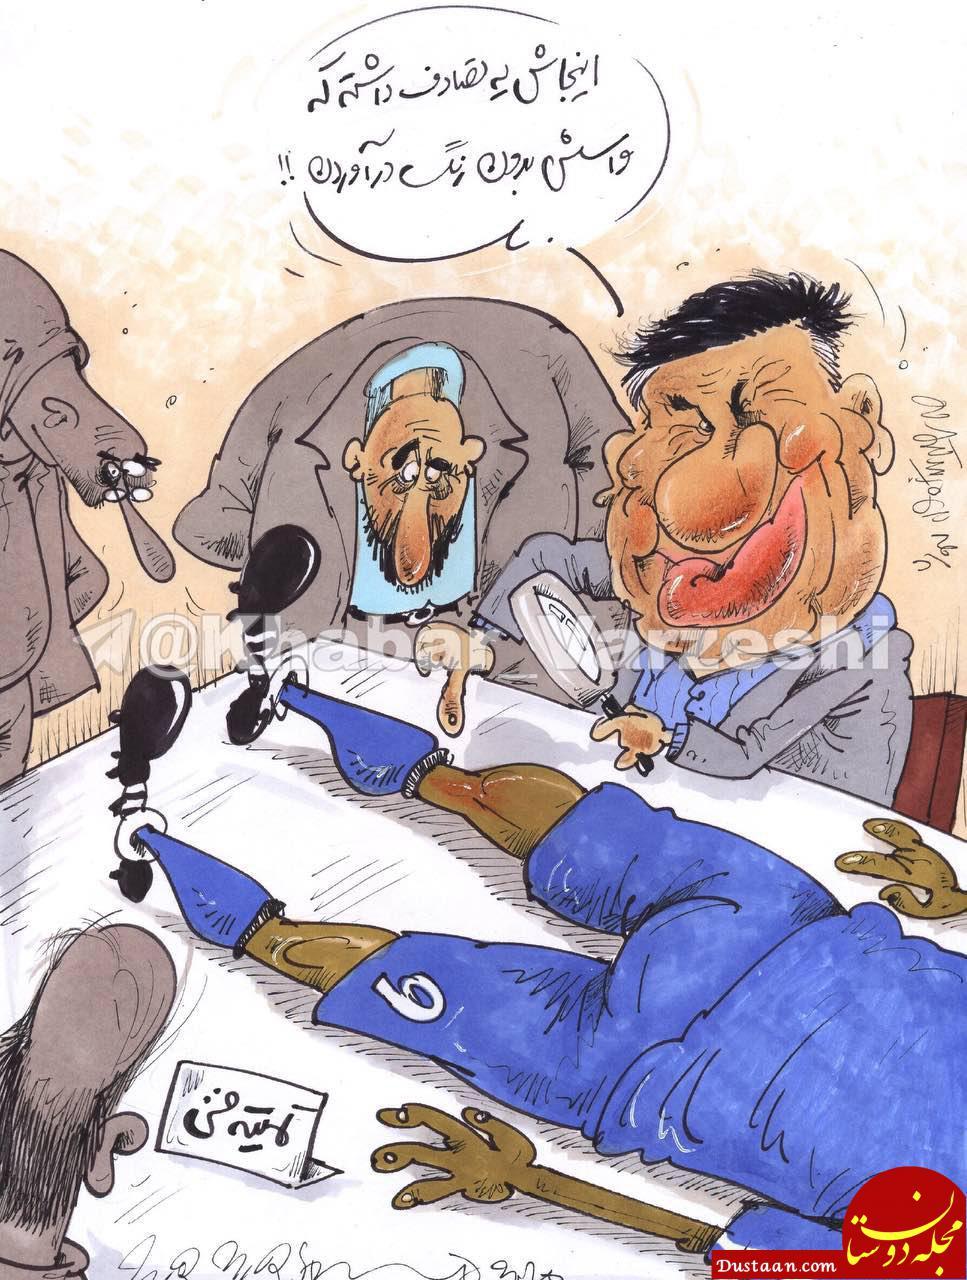 www.dustaan.com مظلومی: وظیفه ما در کمیته فنی این است که روی خریدهای شفر نظر بدهیم!